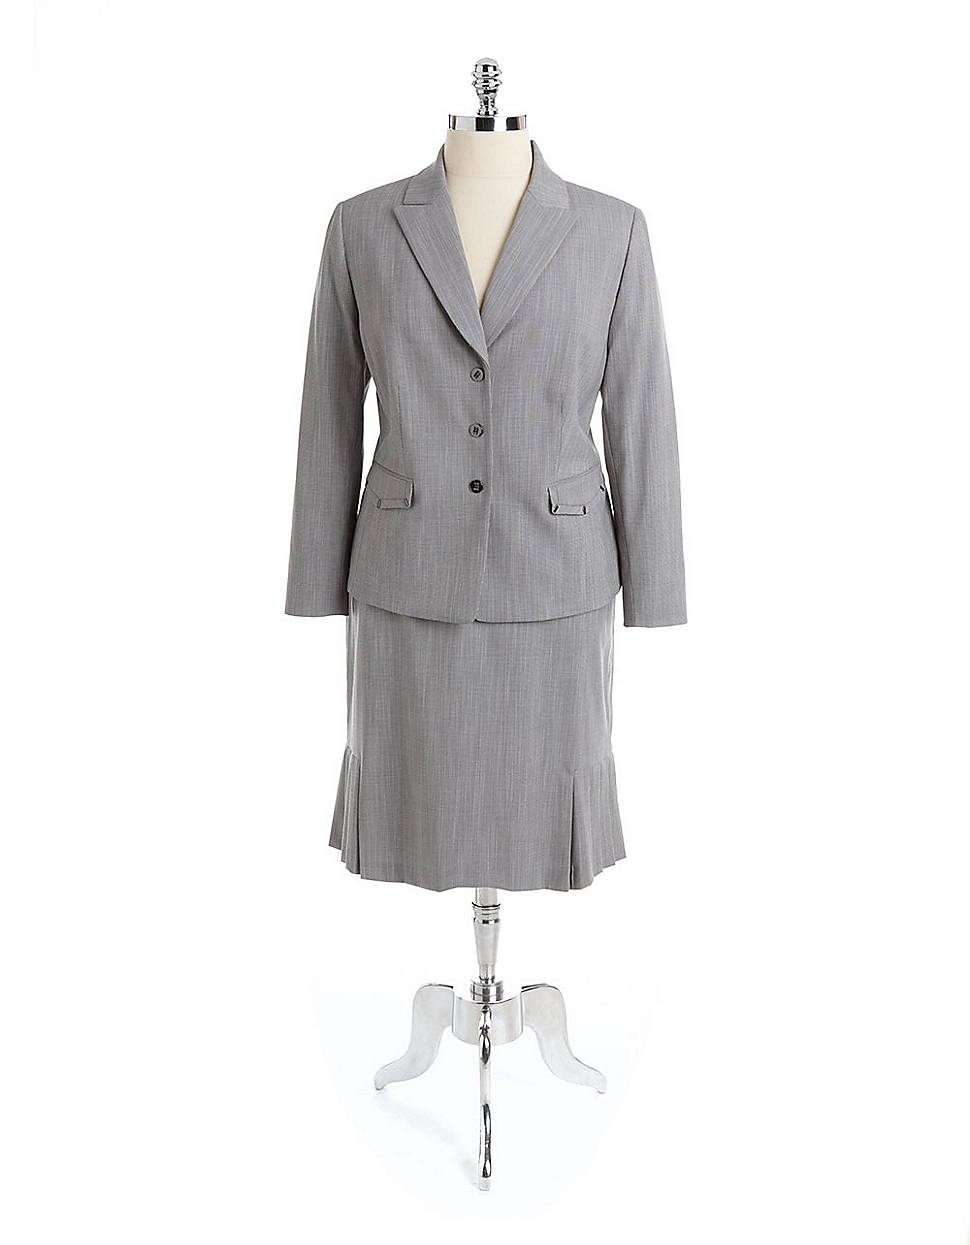 tahari metallic button twopiece pleated skirt suit in